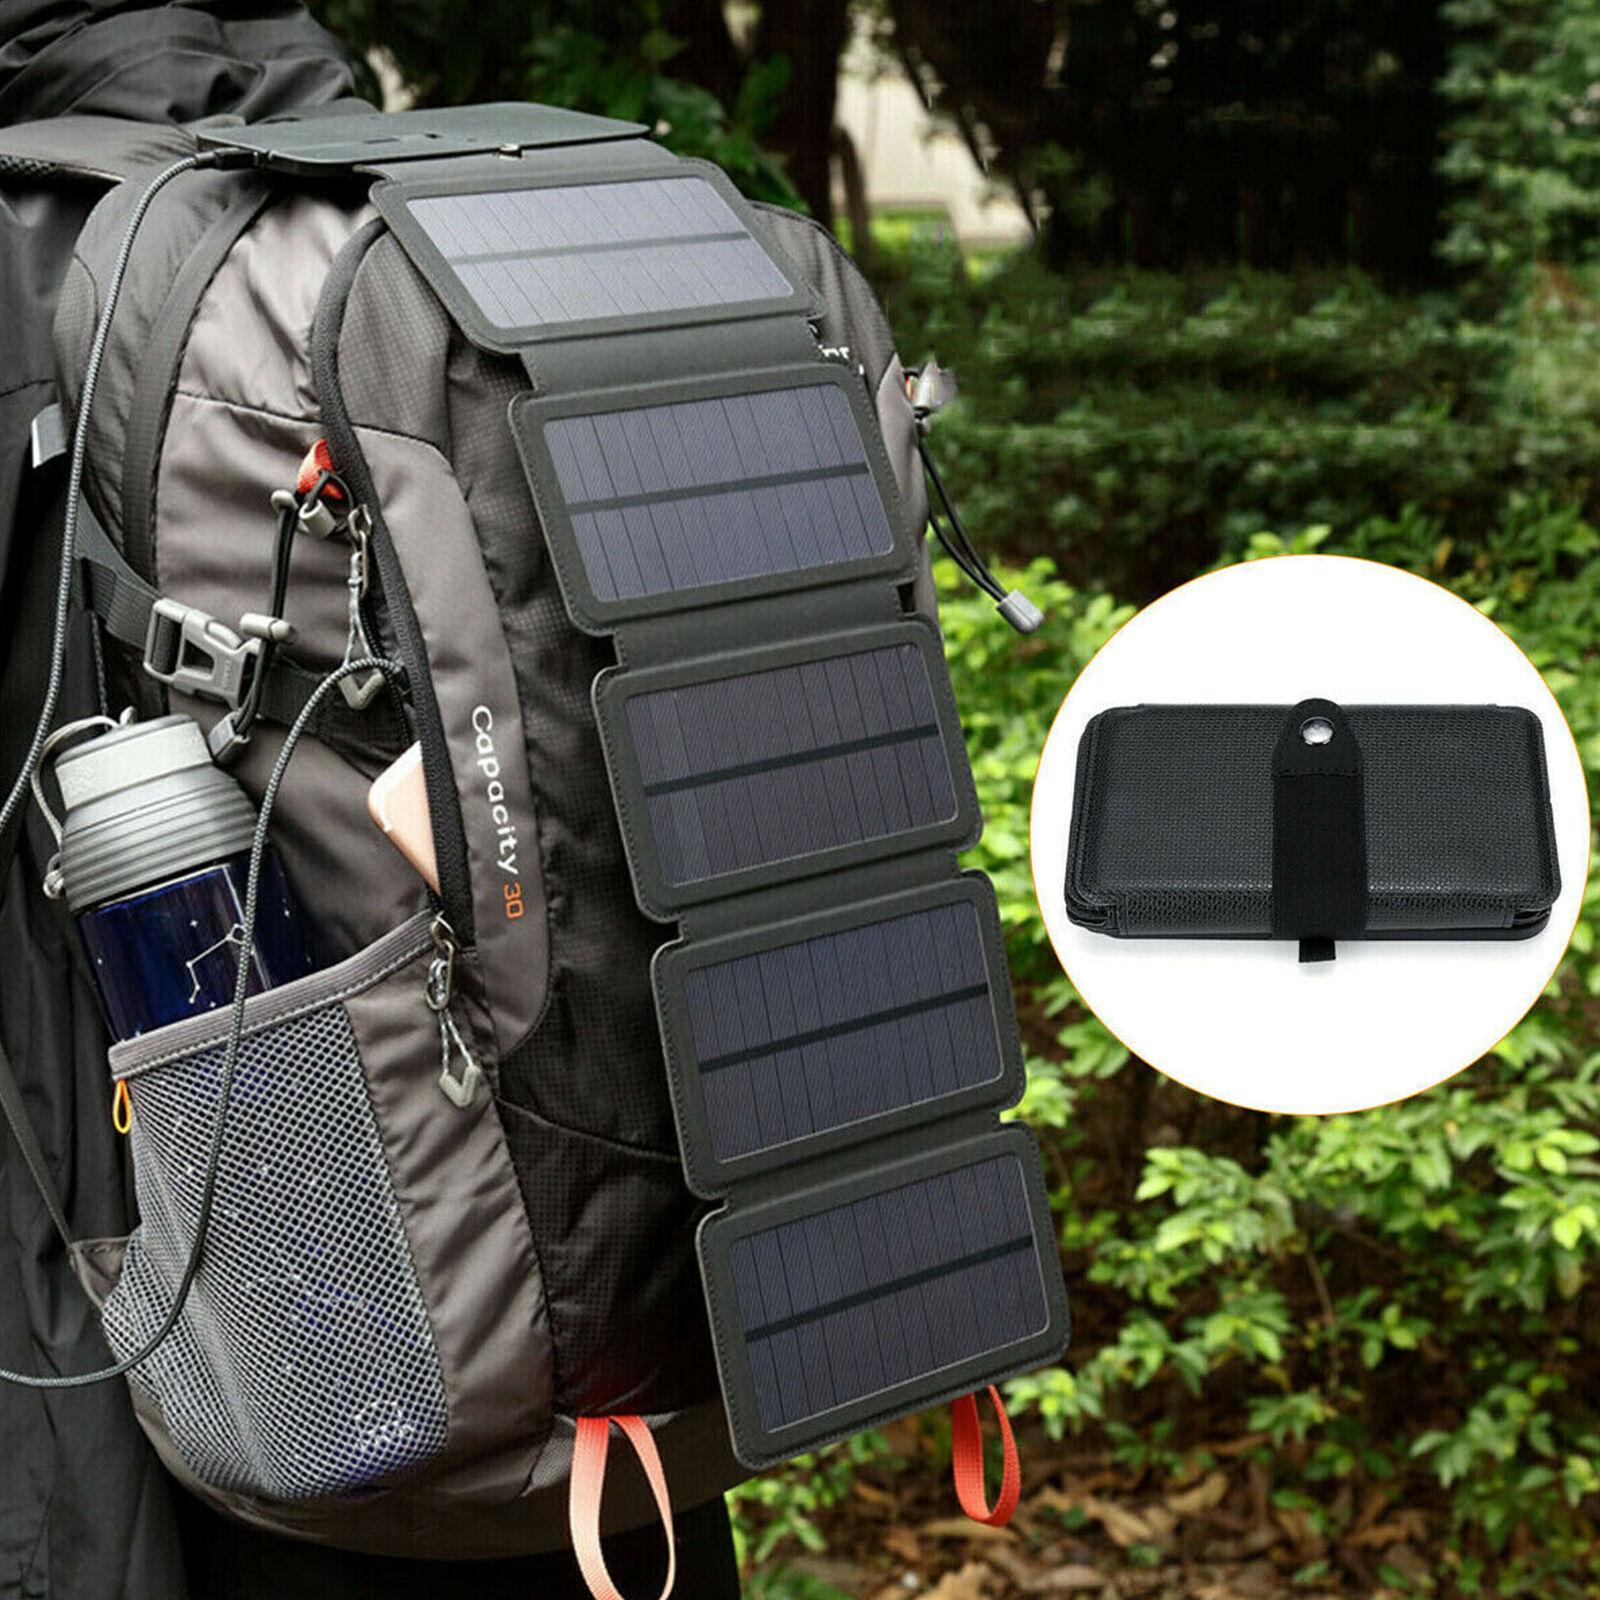 Tragbares Solar-Handy-Ladegerät Power Bank Wasserdichtes Camping im Freien